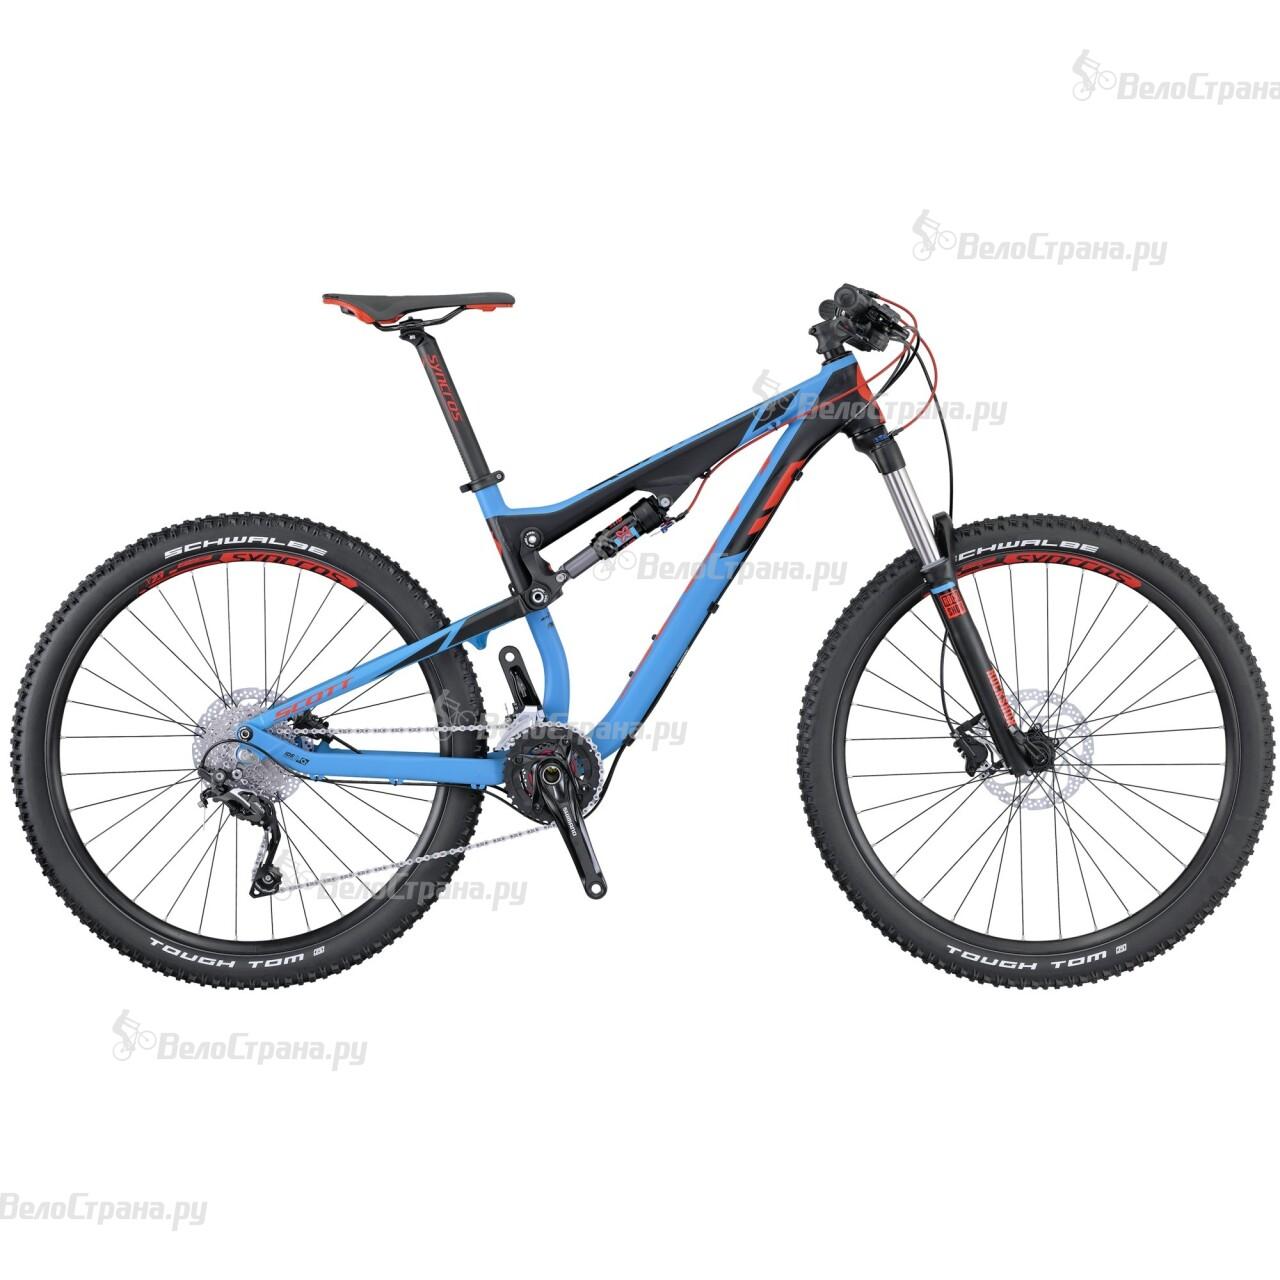 Велосипед Scott GENIUS 750 (2016)